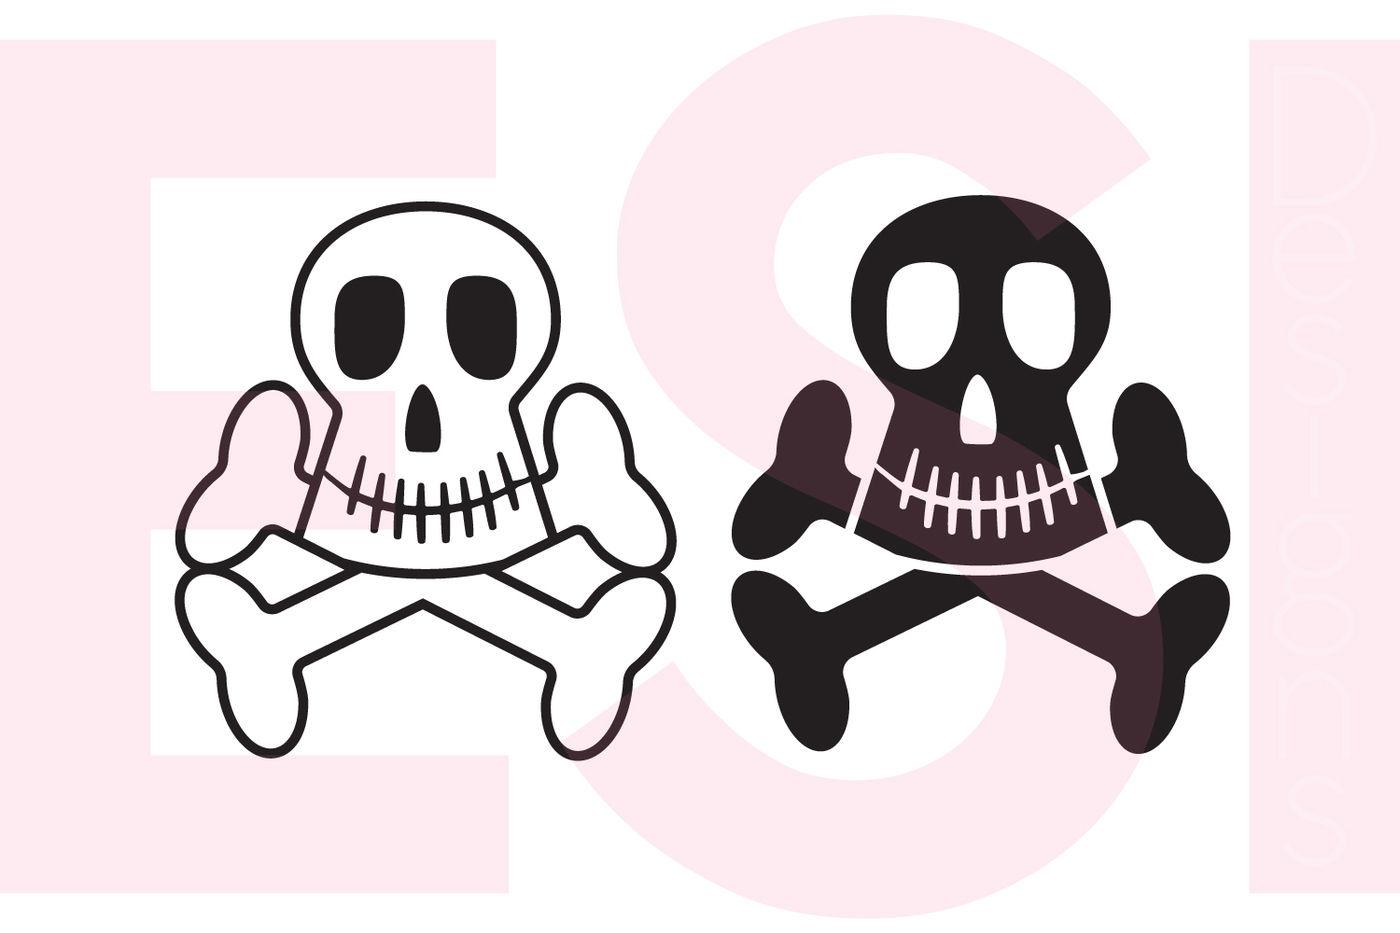 Skull Crossbones Set Svg Dxf Eps Png Cutting Files By Esi Designs Thehungryjpeg Com